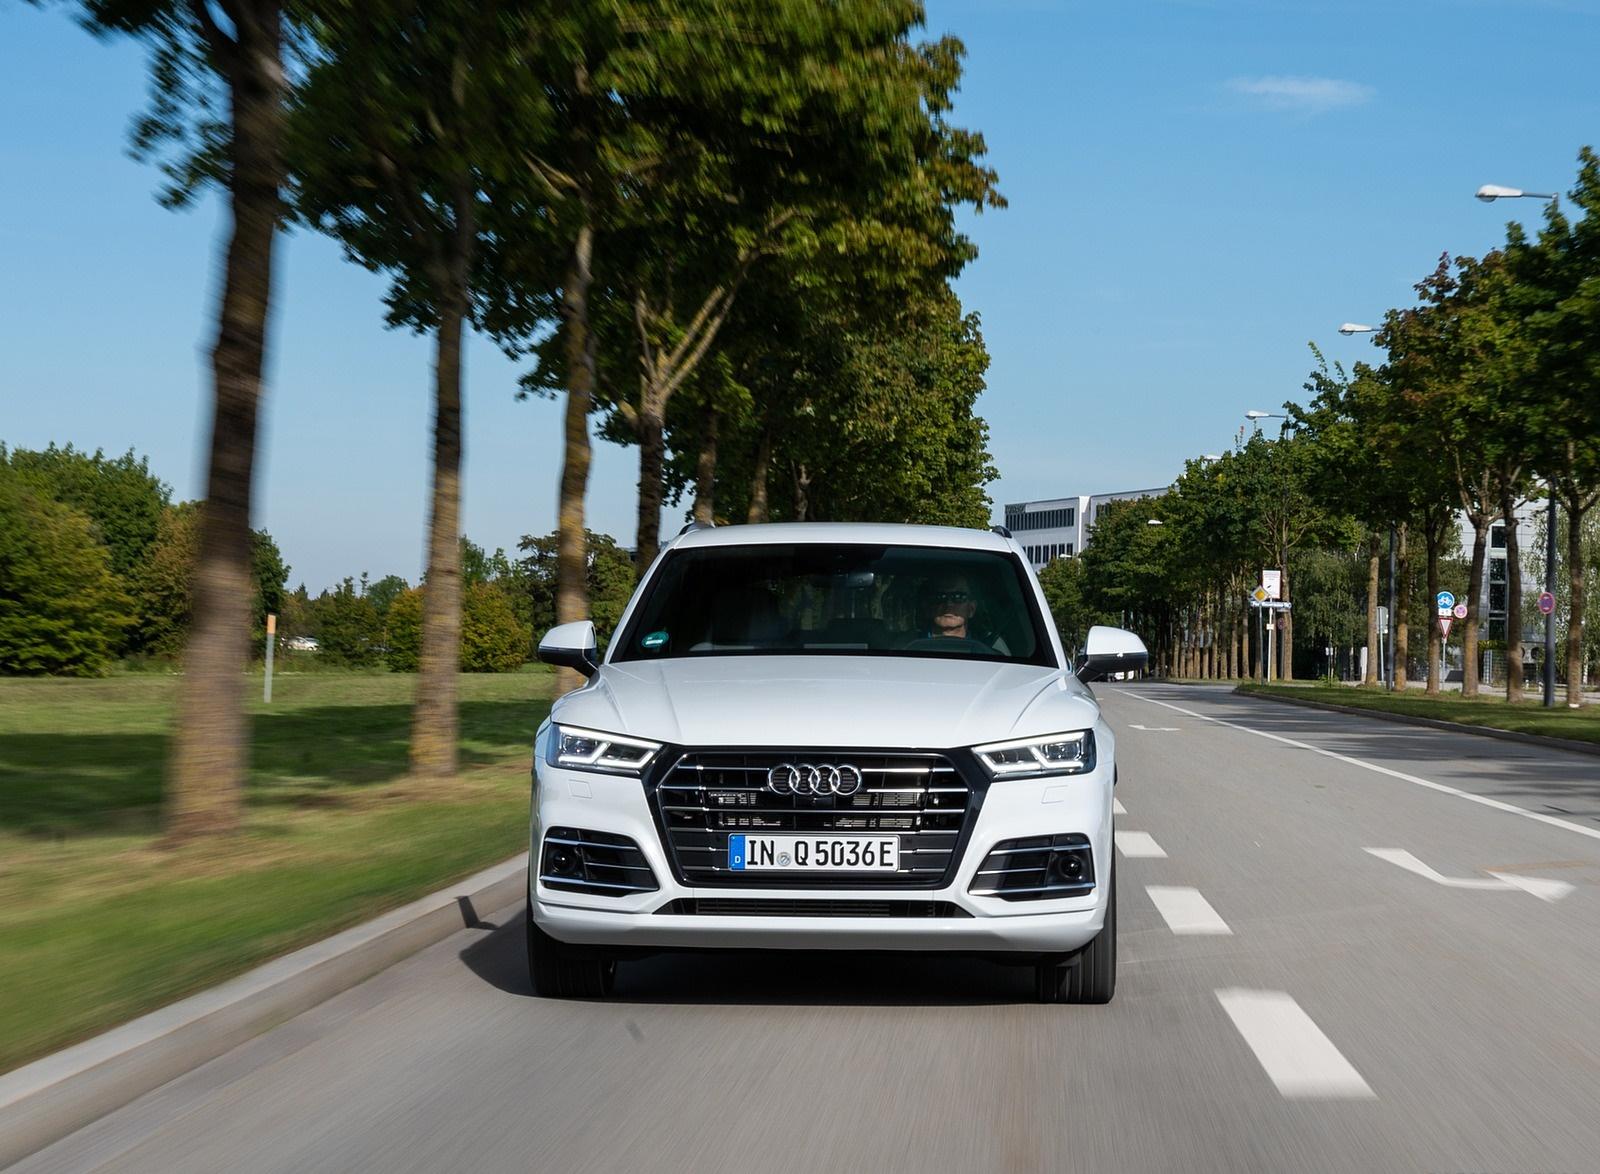 2020 Audi Q5 TFSI e Plug-In Hybrid (Color: Glacier White) Front Wallpapers (9)